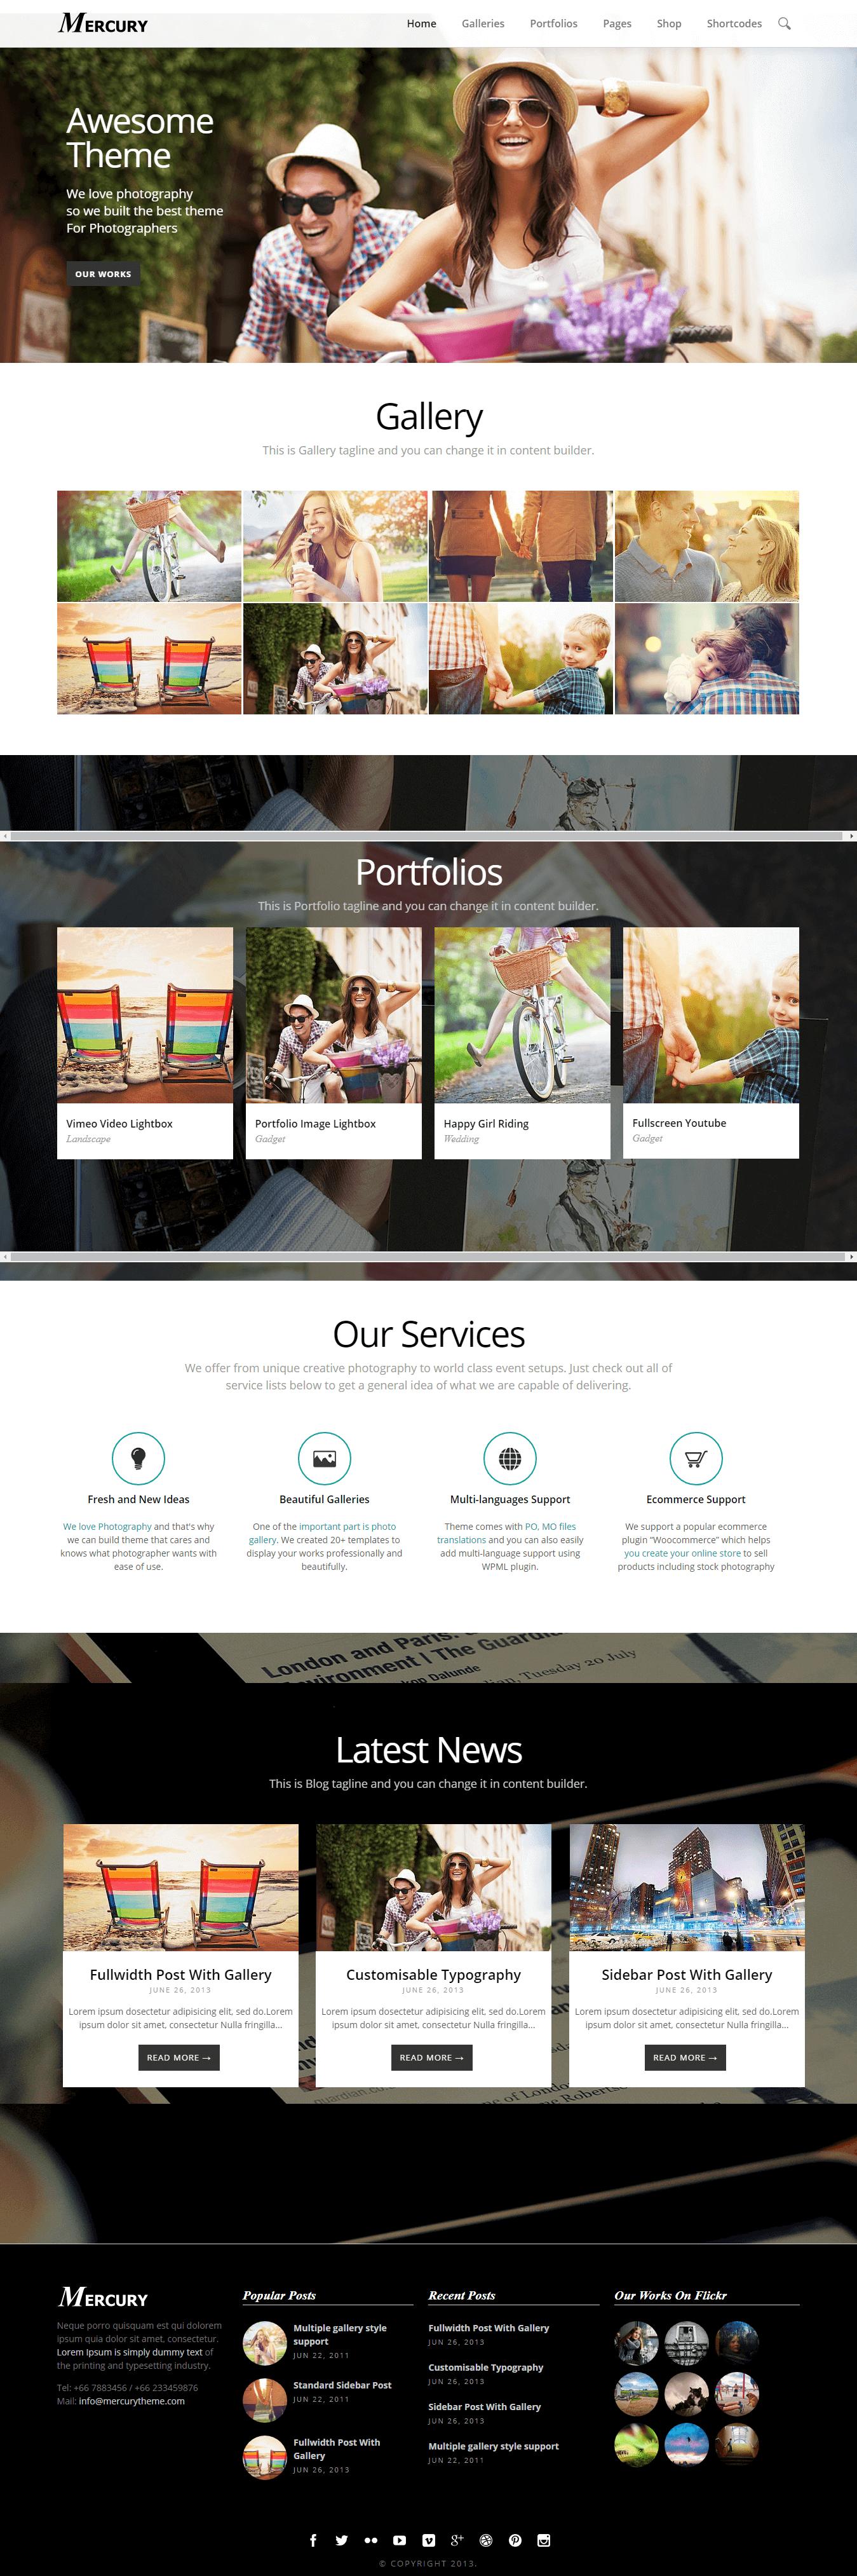 Mercury - Premium Photography WordPress Themes and Templates